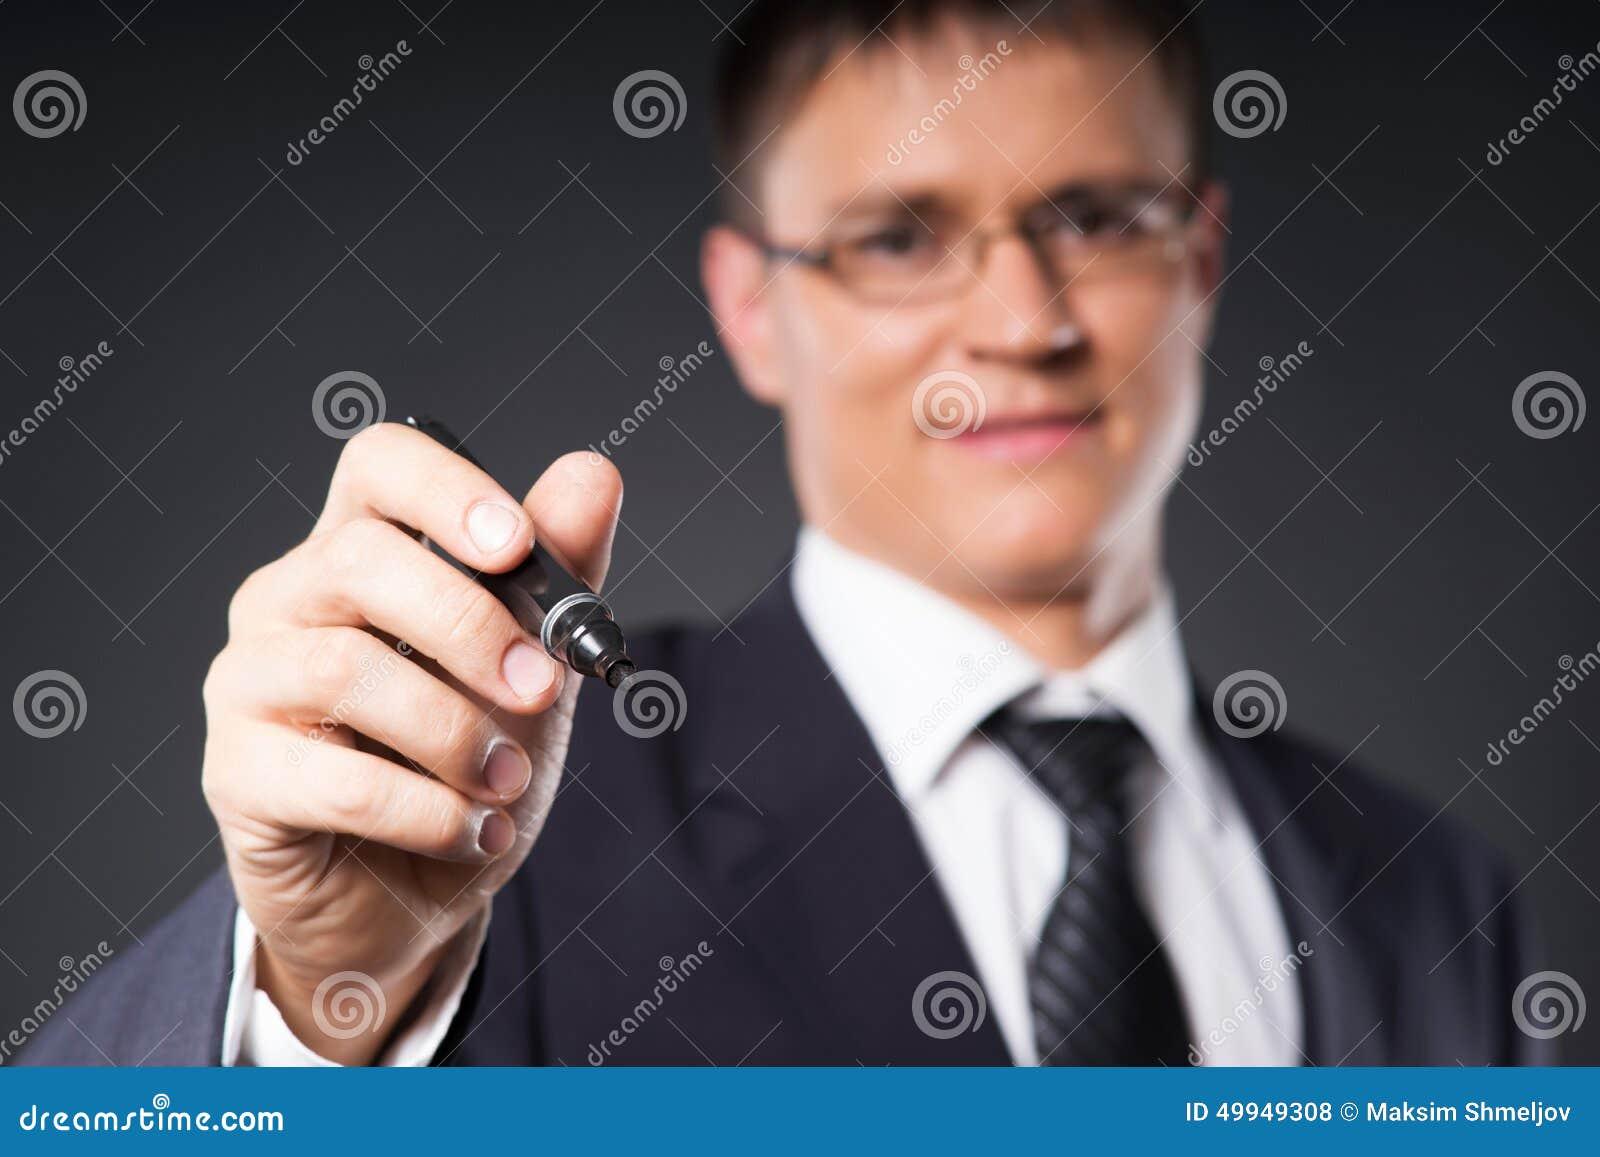 Essay about successful businessman